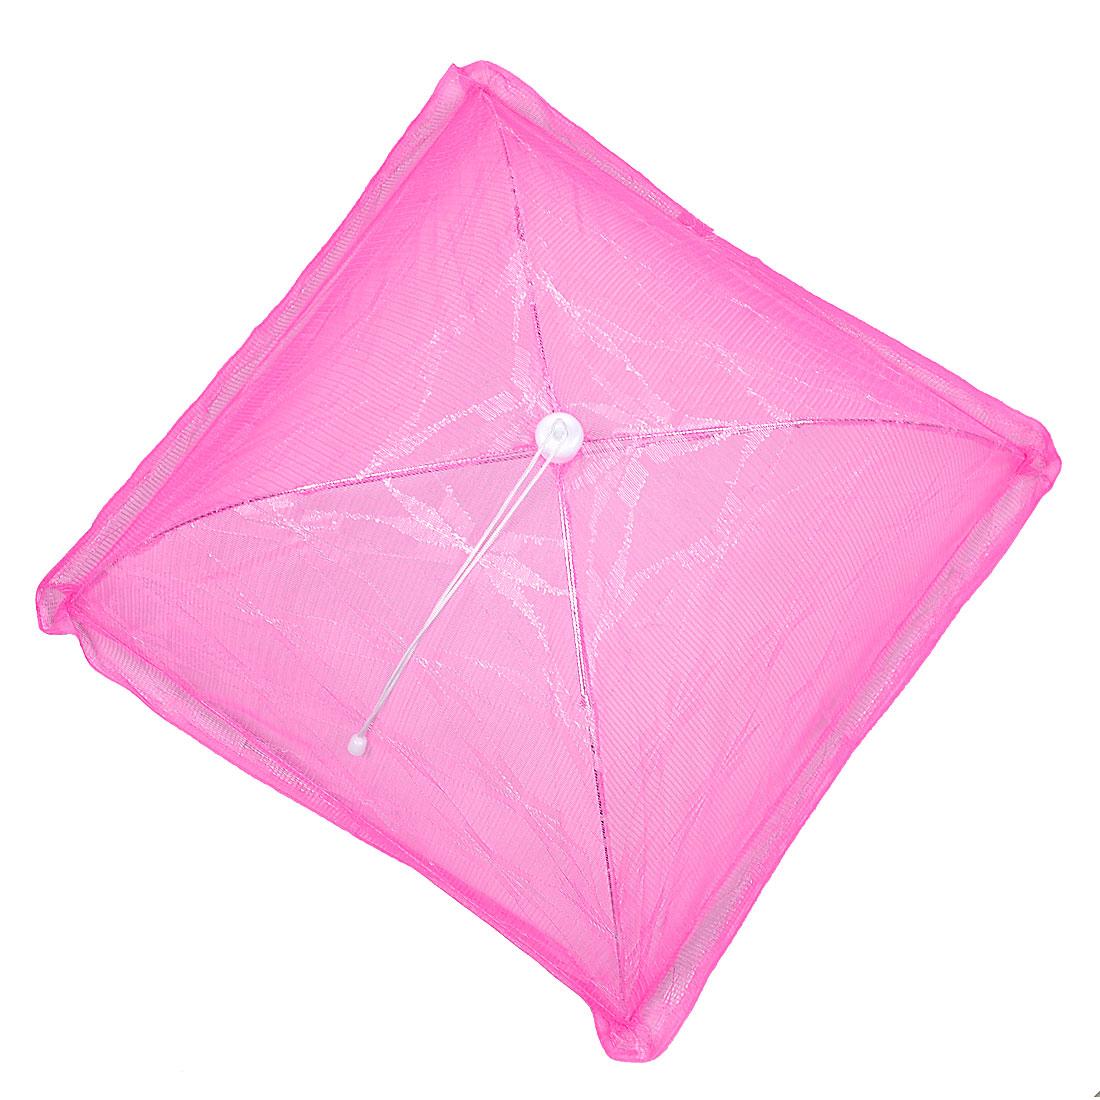 57cm x 57cm Pink Nylon Sheer Folding Foldable Picnic Food Cover